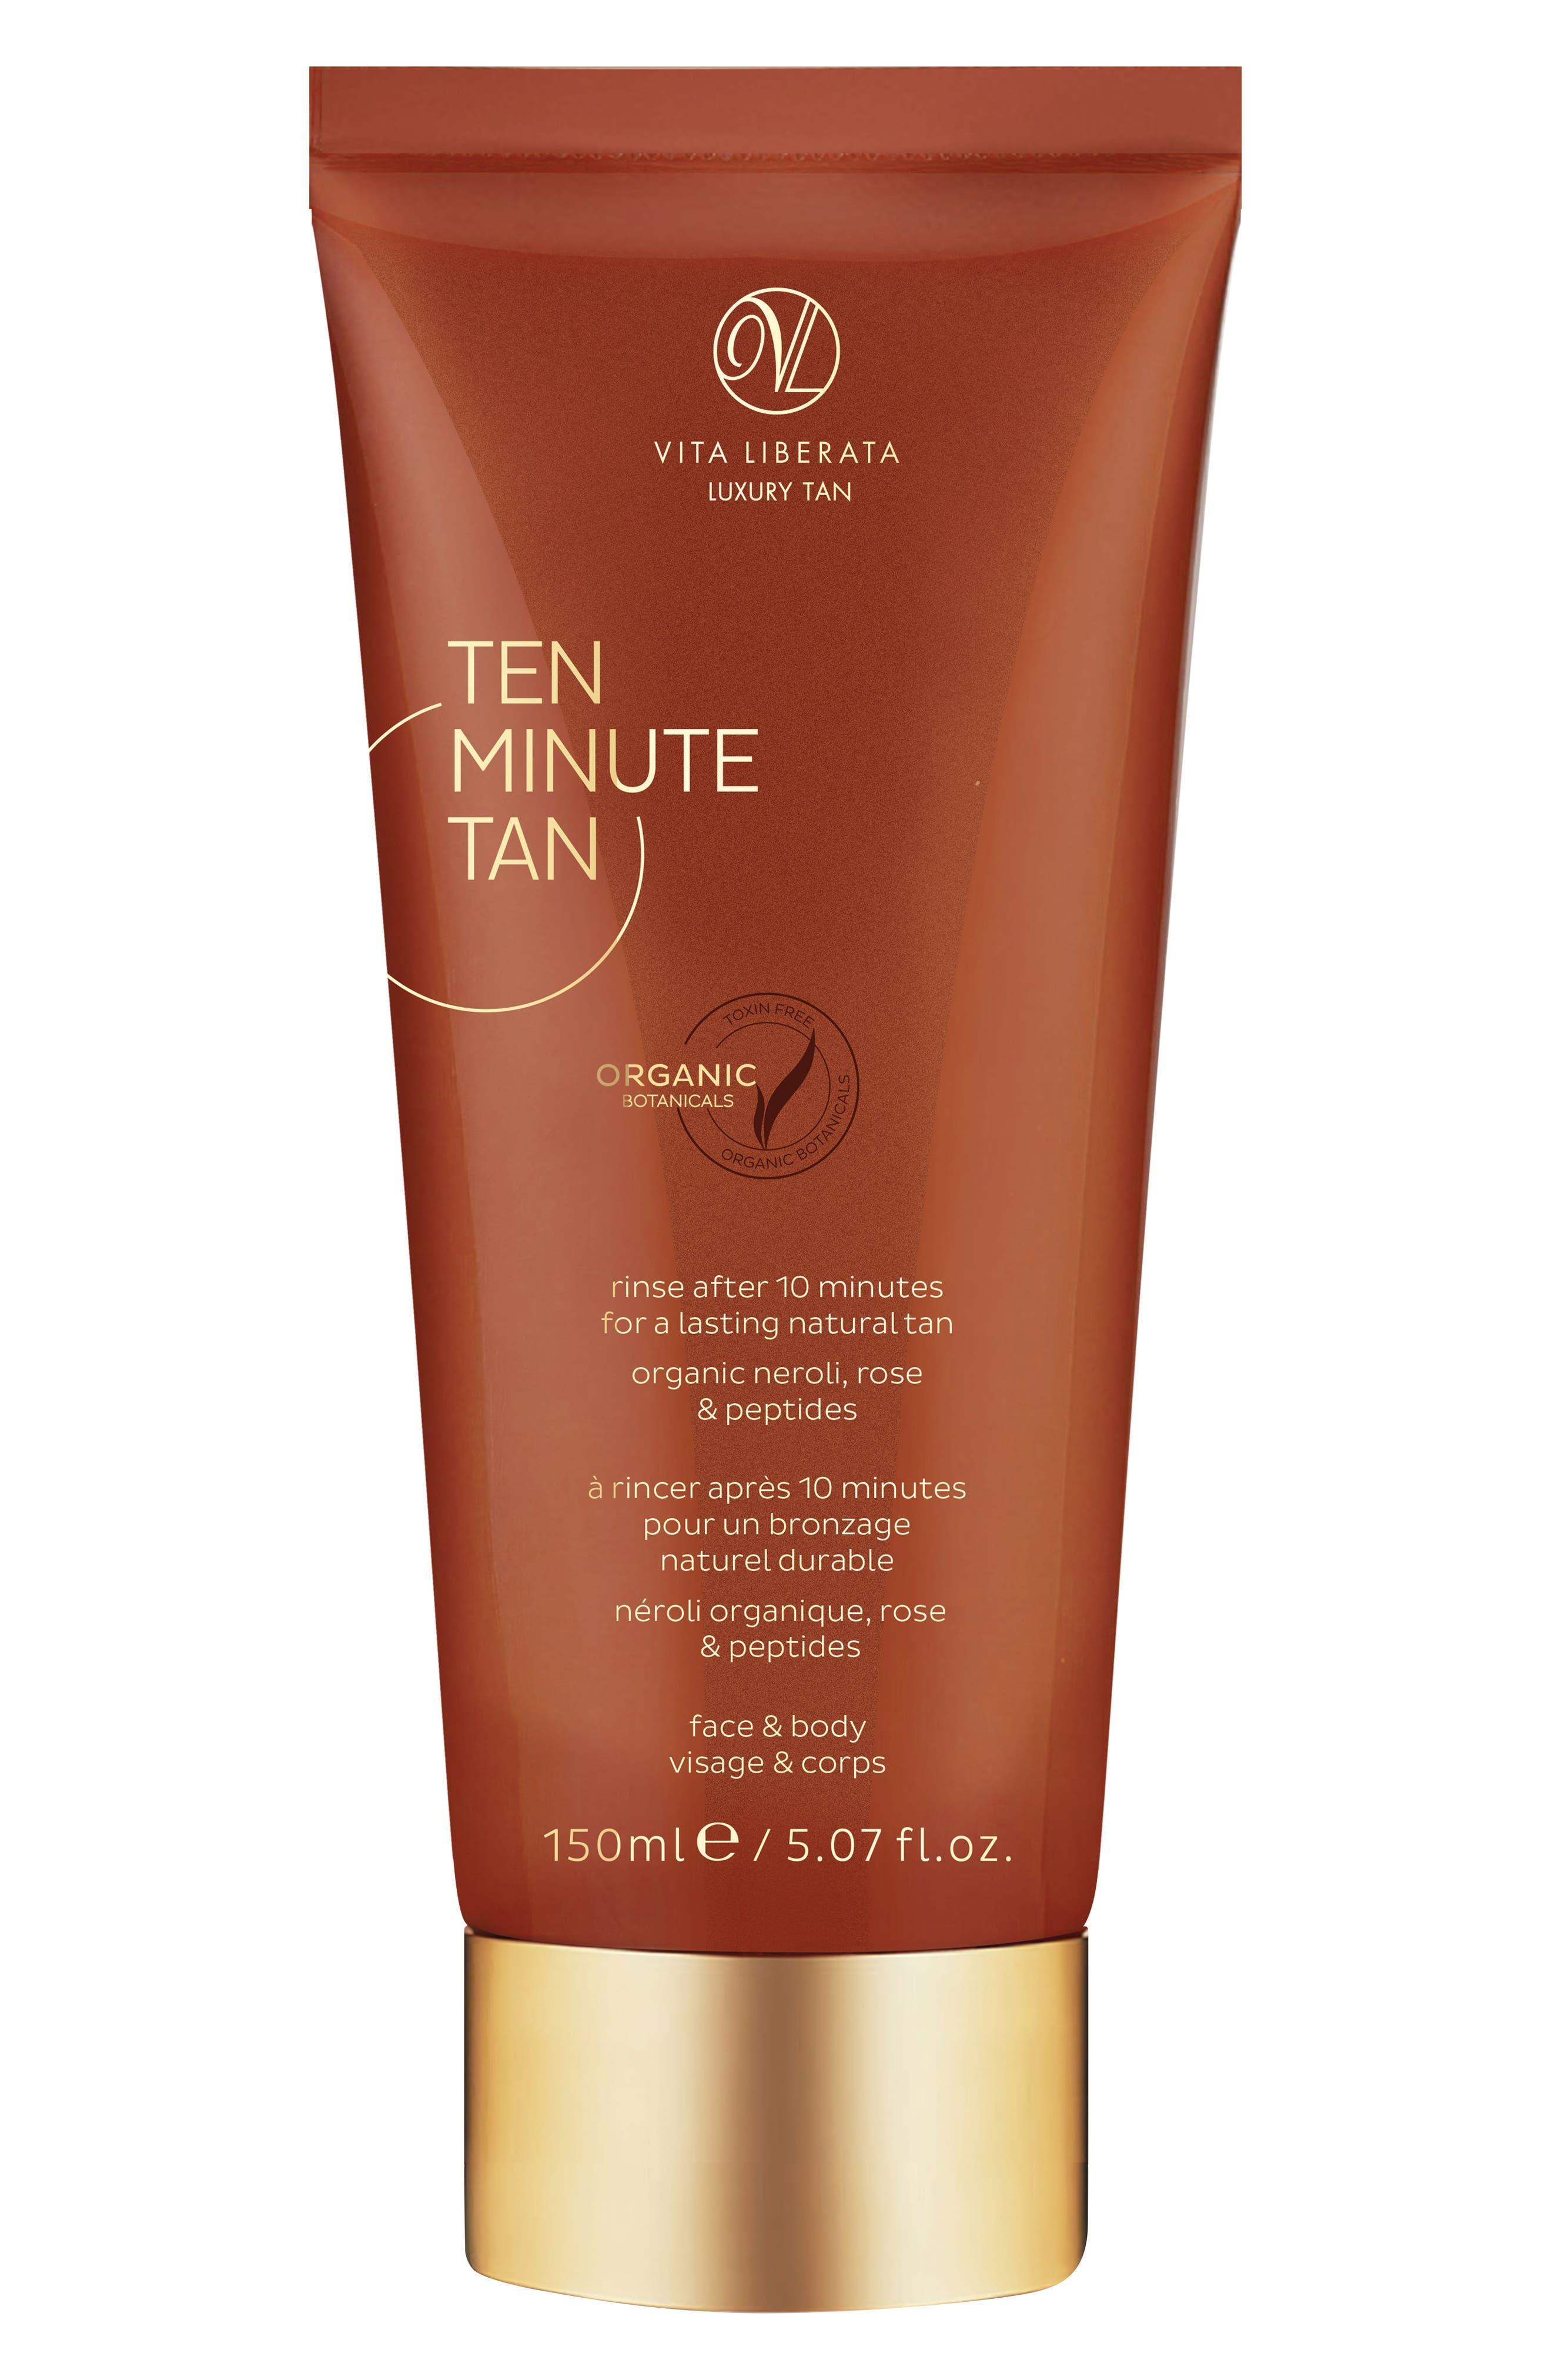 Main Image - VITA LIBERATA Ten Minute Tan for Face & Body